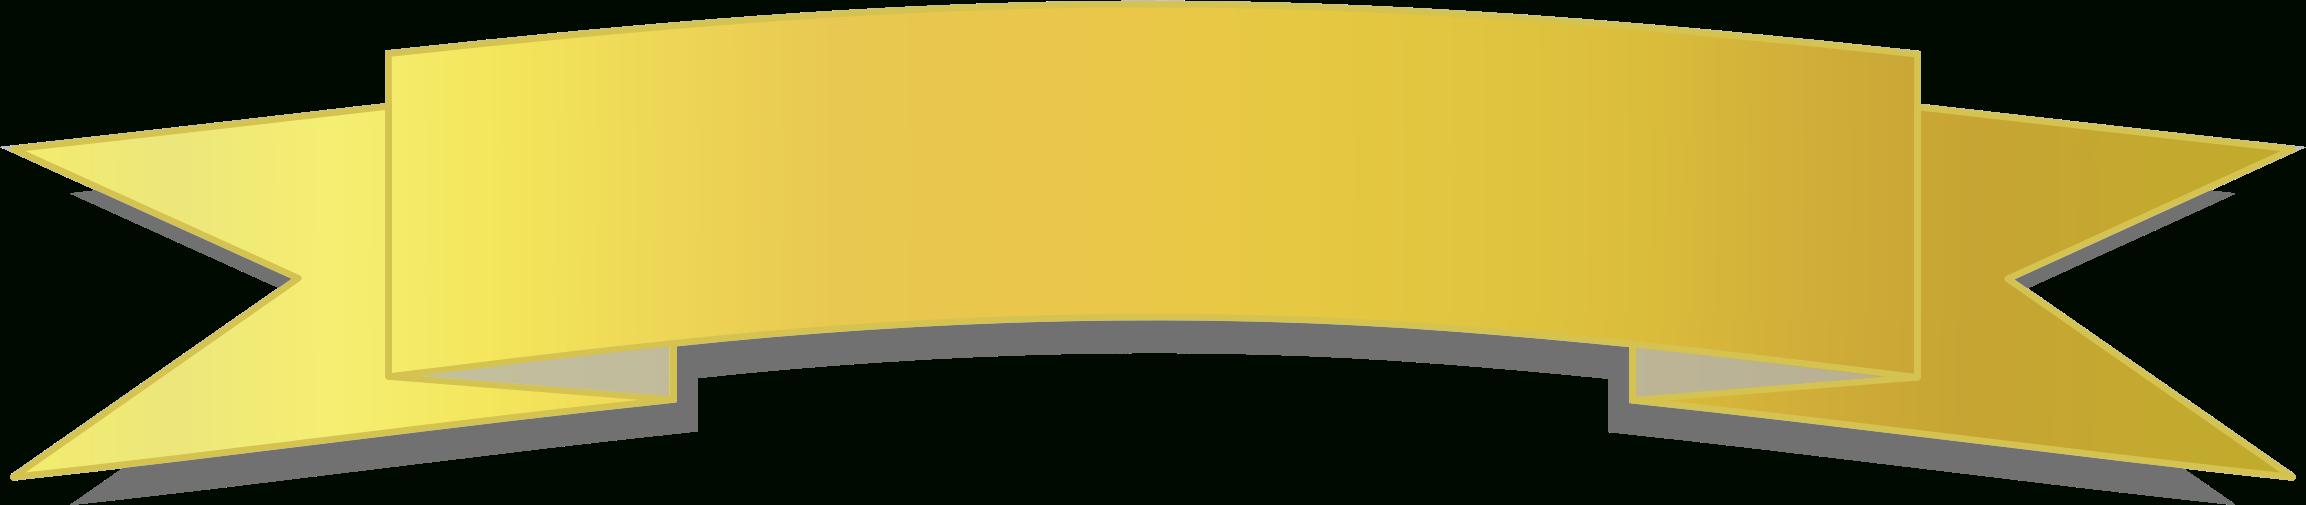 Gold clip art cyberuse. Pencil clipart banner